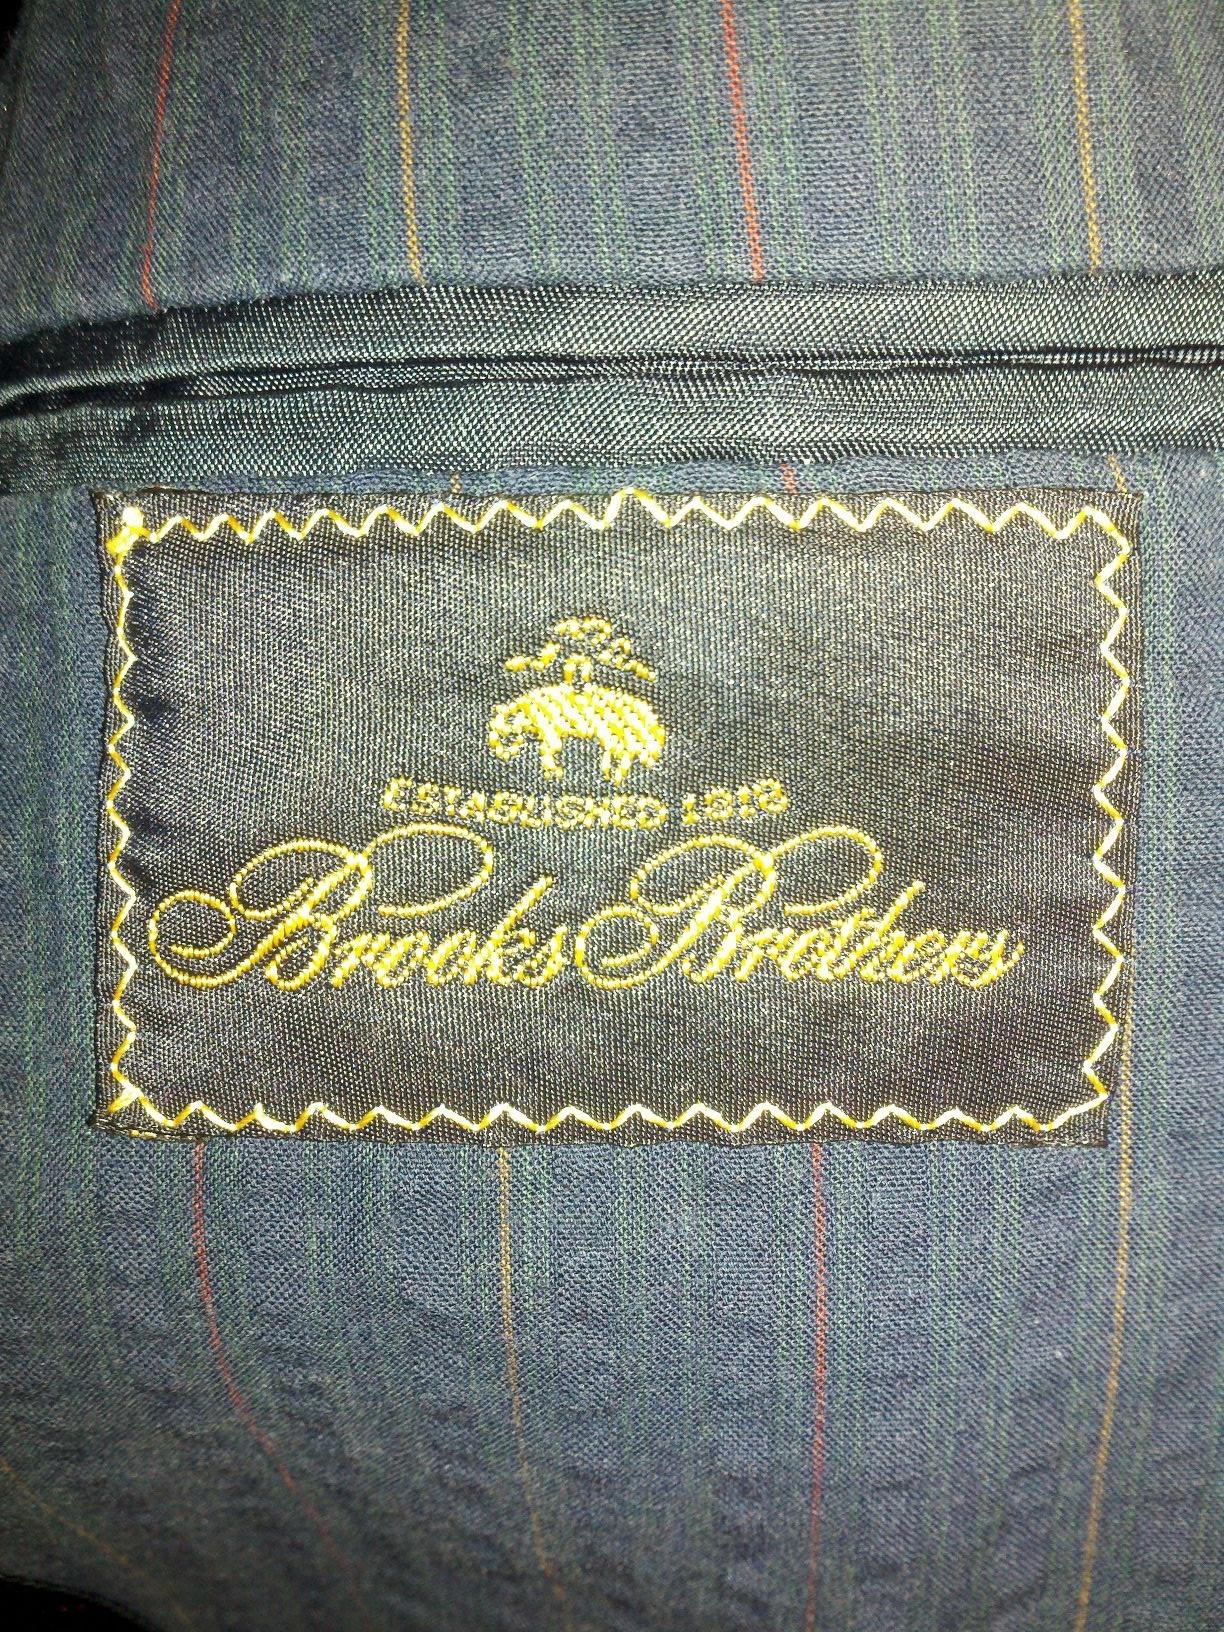 BB Cotton Label.jpg